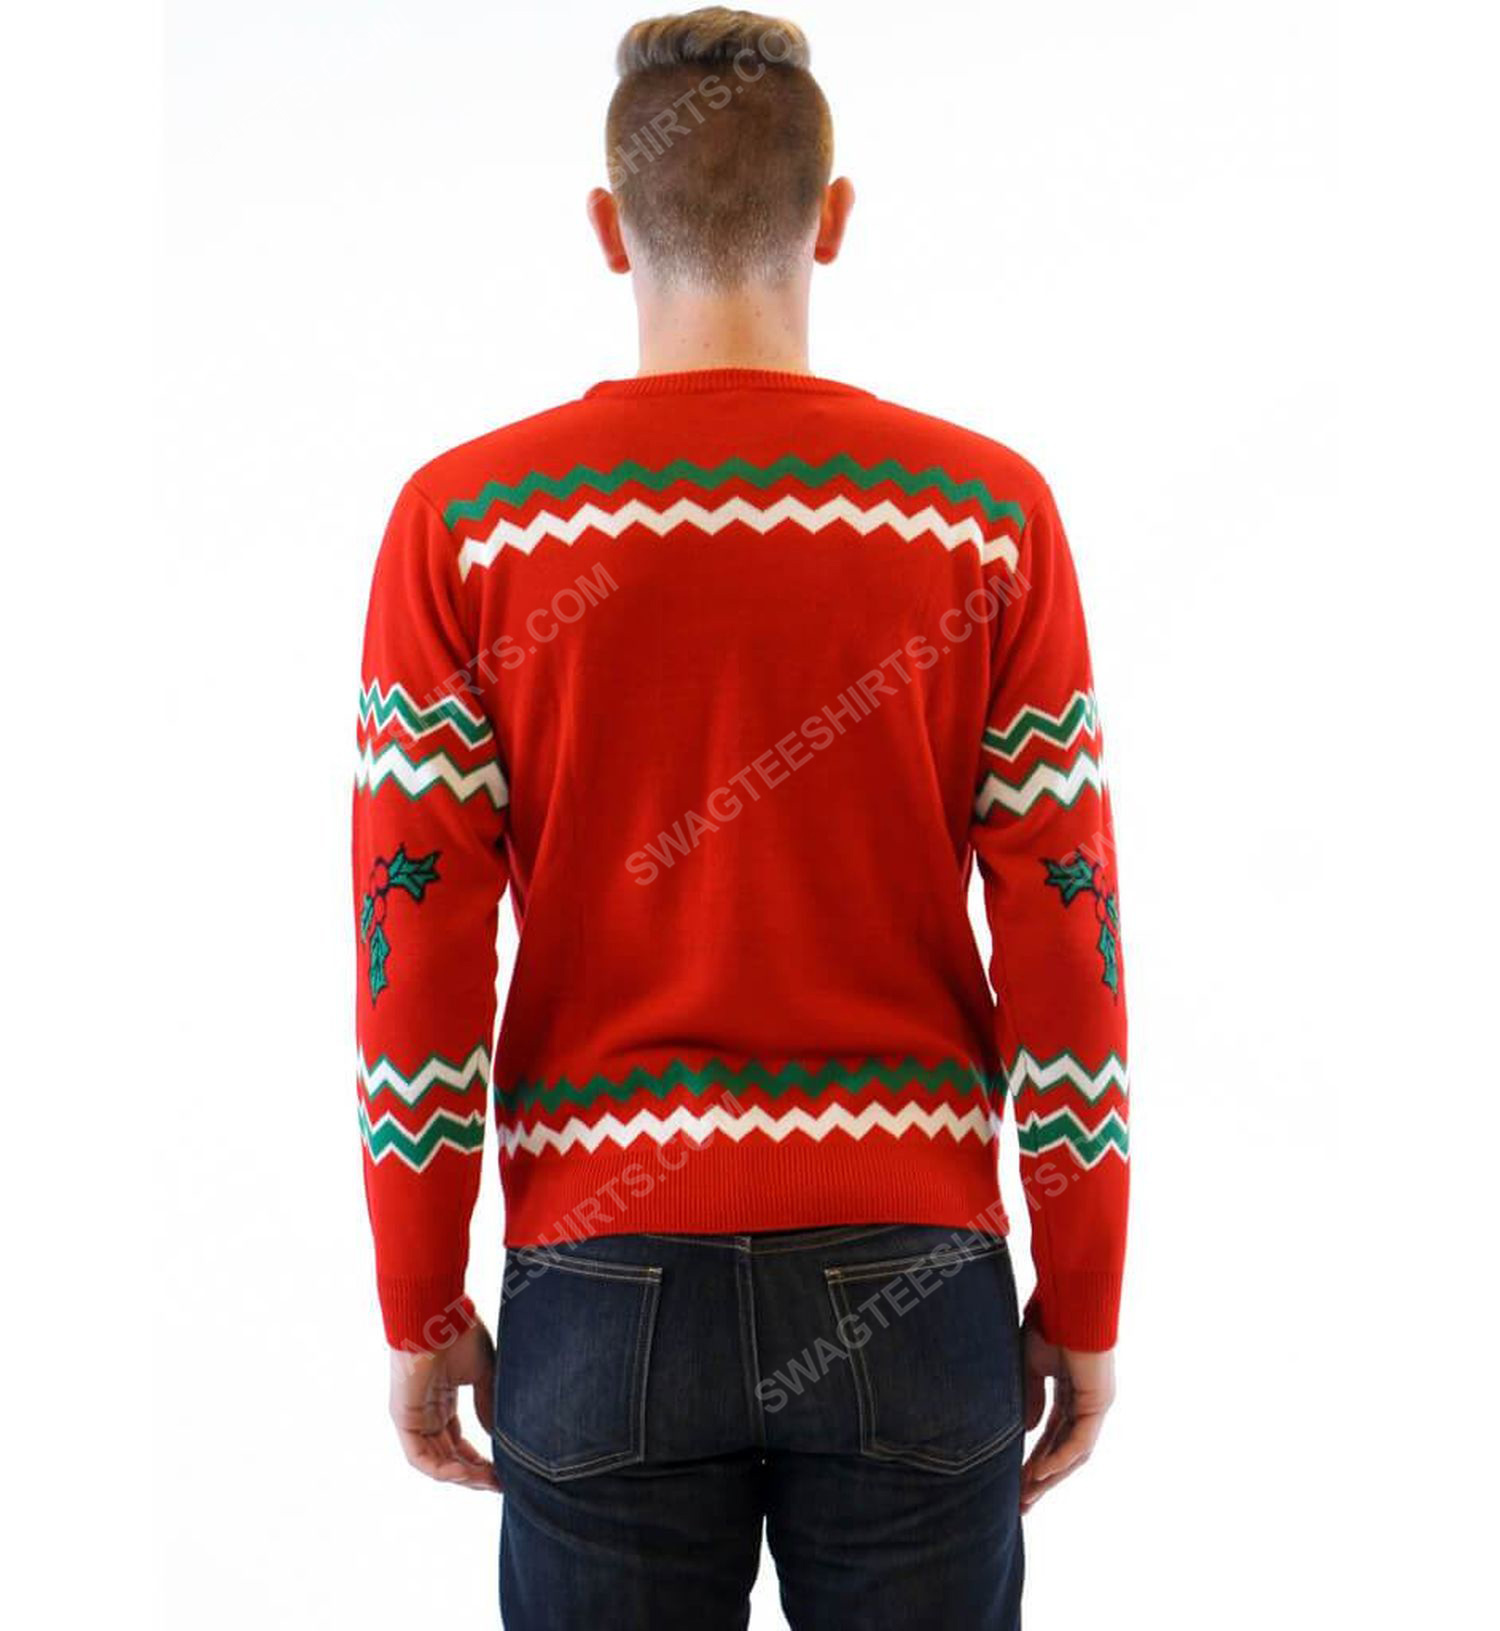 Let's get elfed up drunken elves full print ugly christmas sweater 3